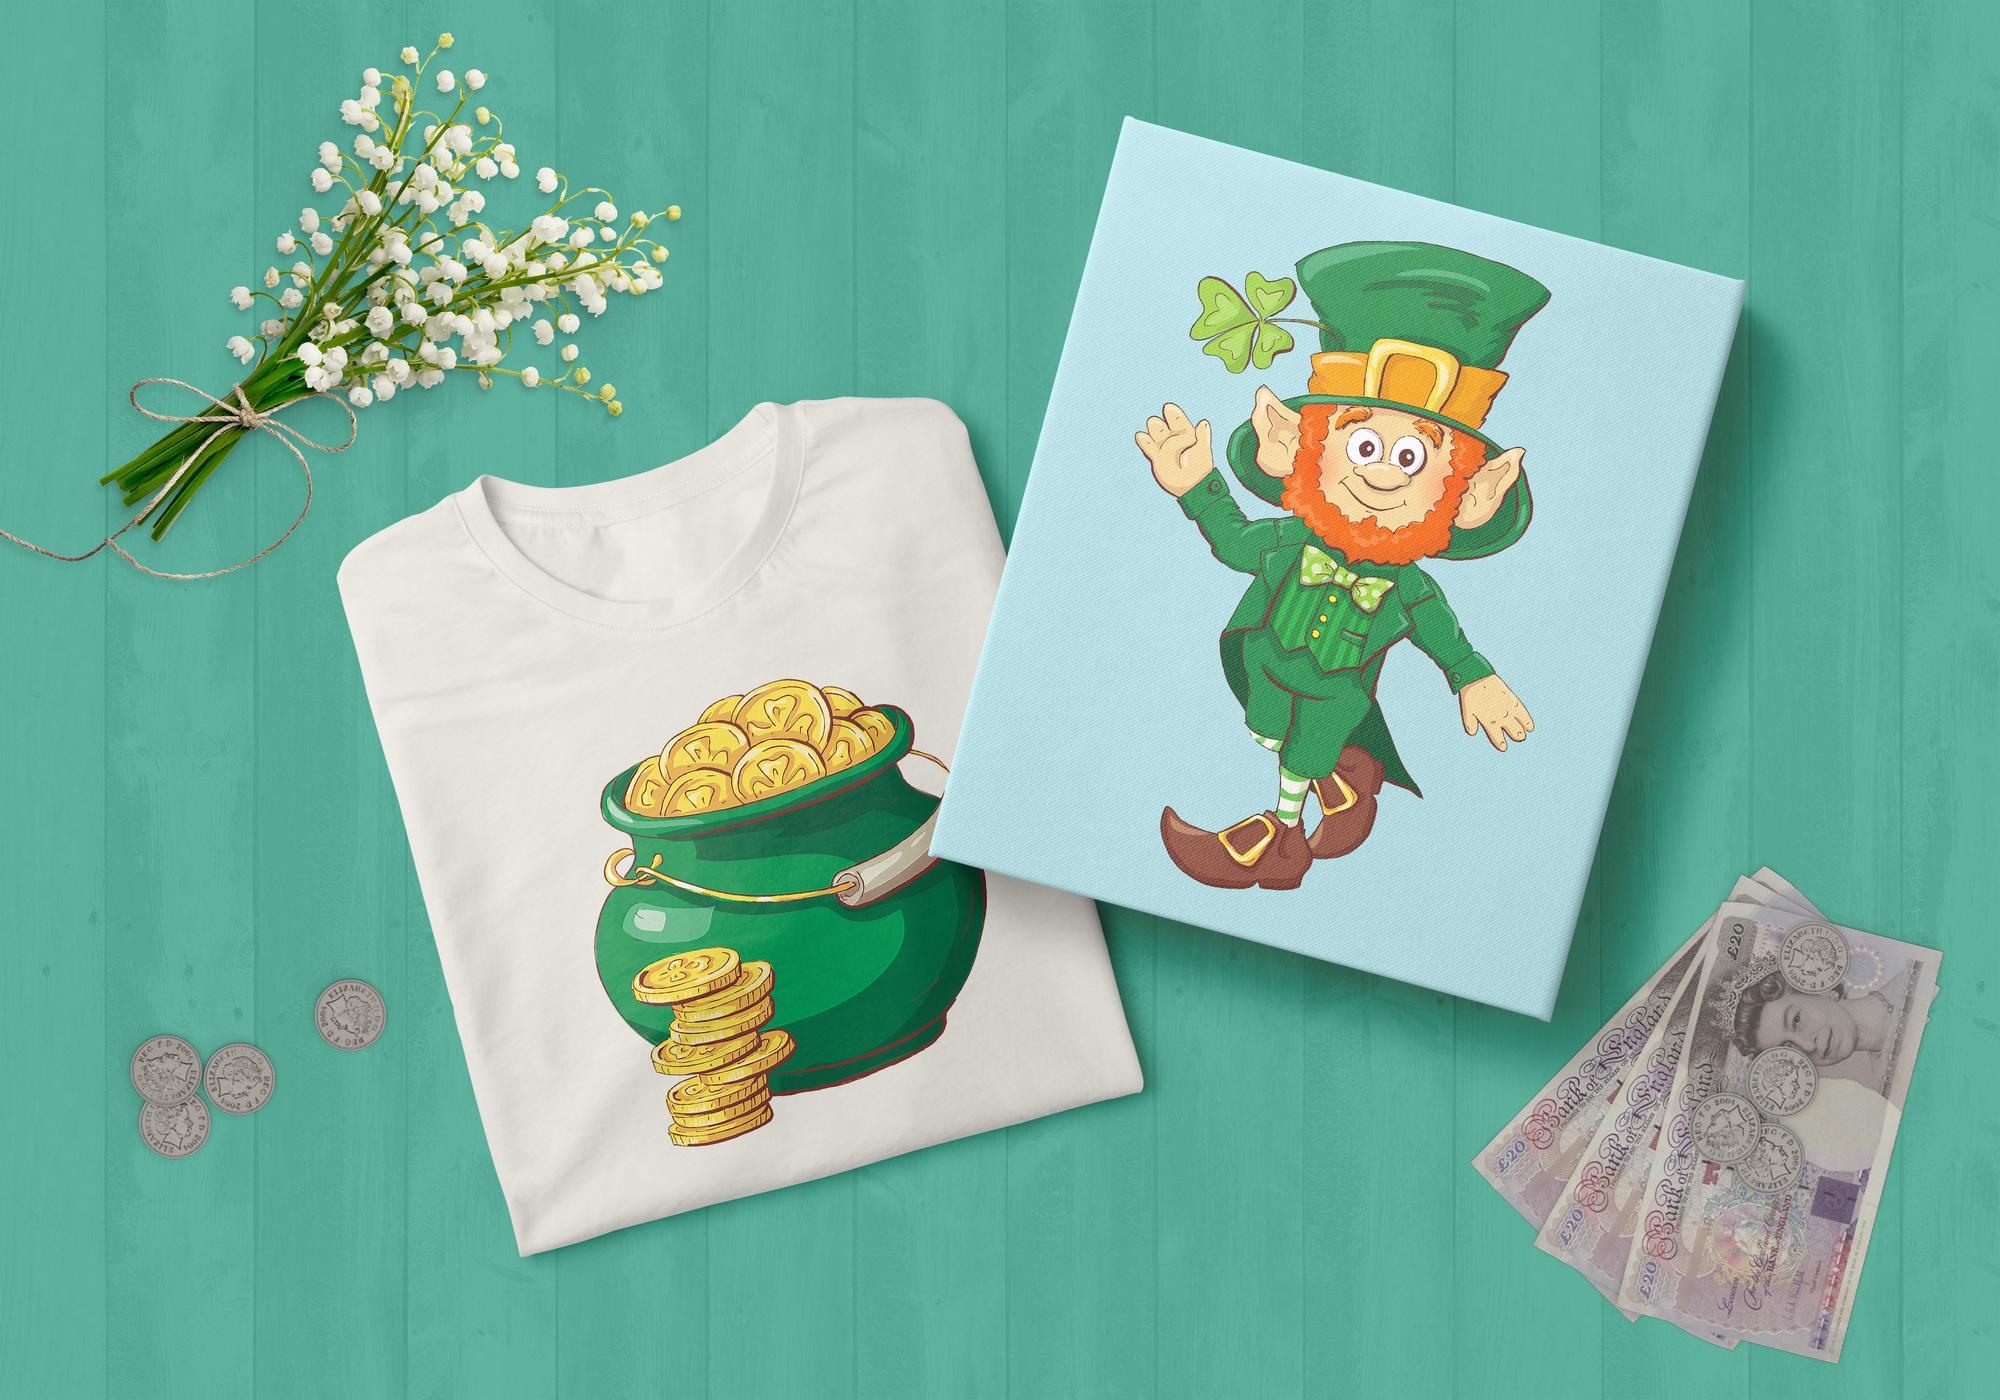 Leprechaun St. Patrick's Day Illustrations Set - $21 - 7 prewiew